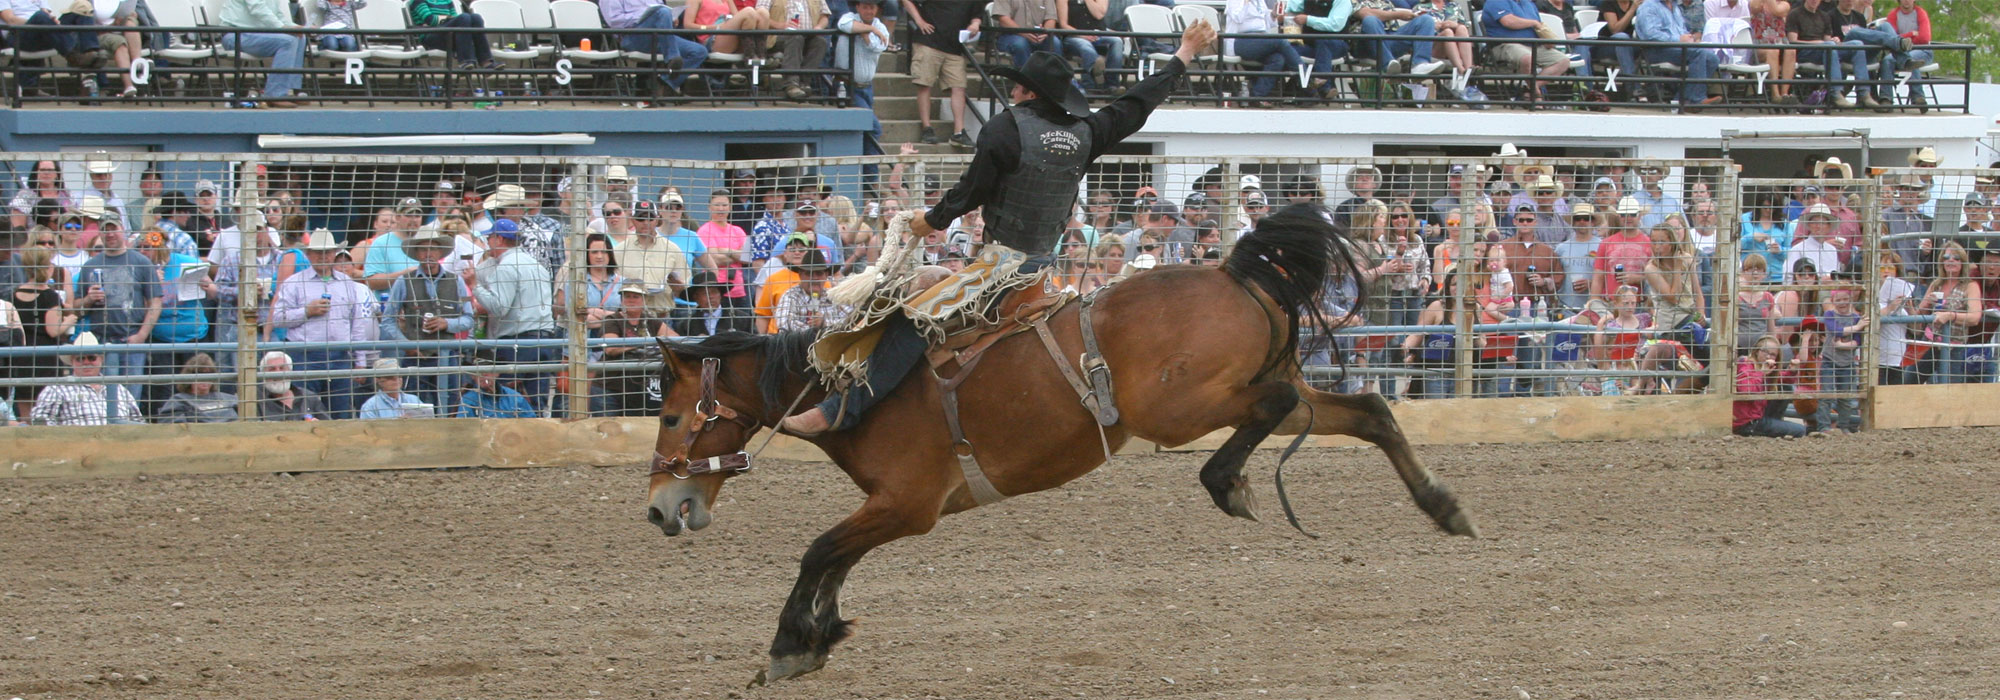 slider – Bucking Horse